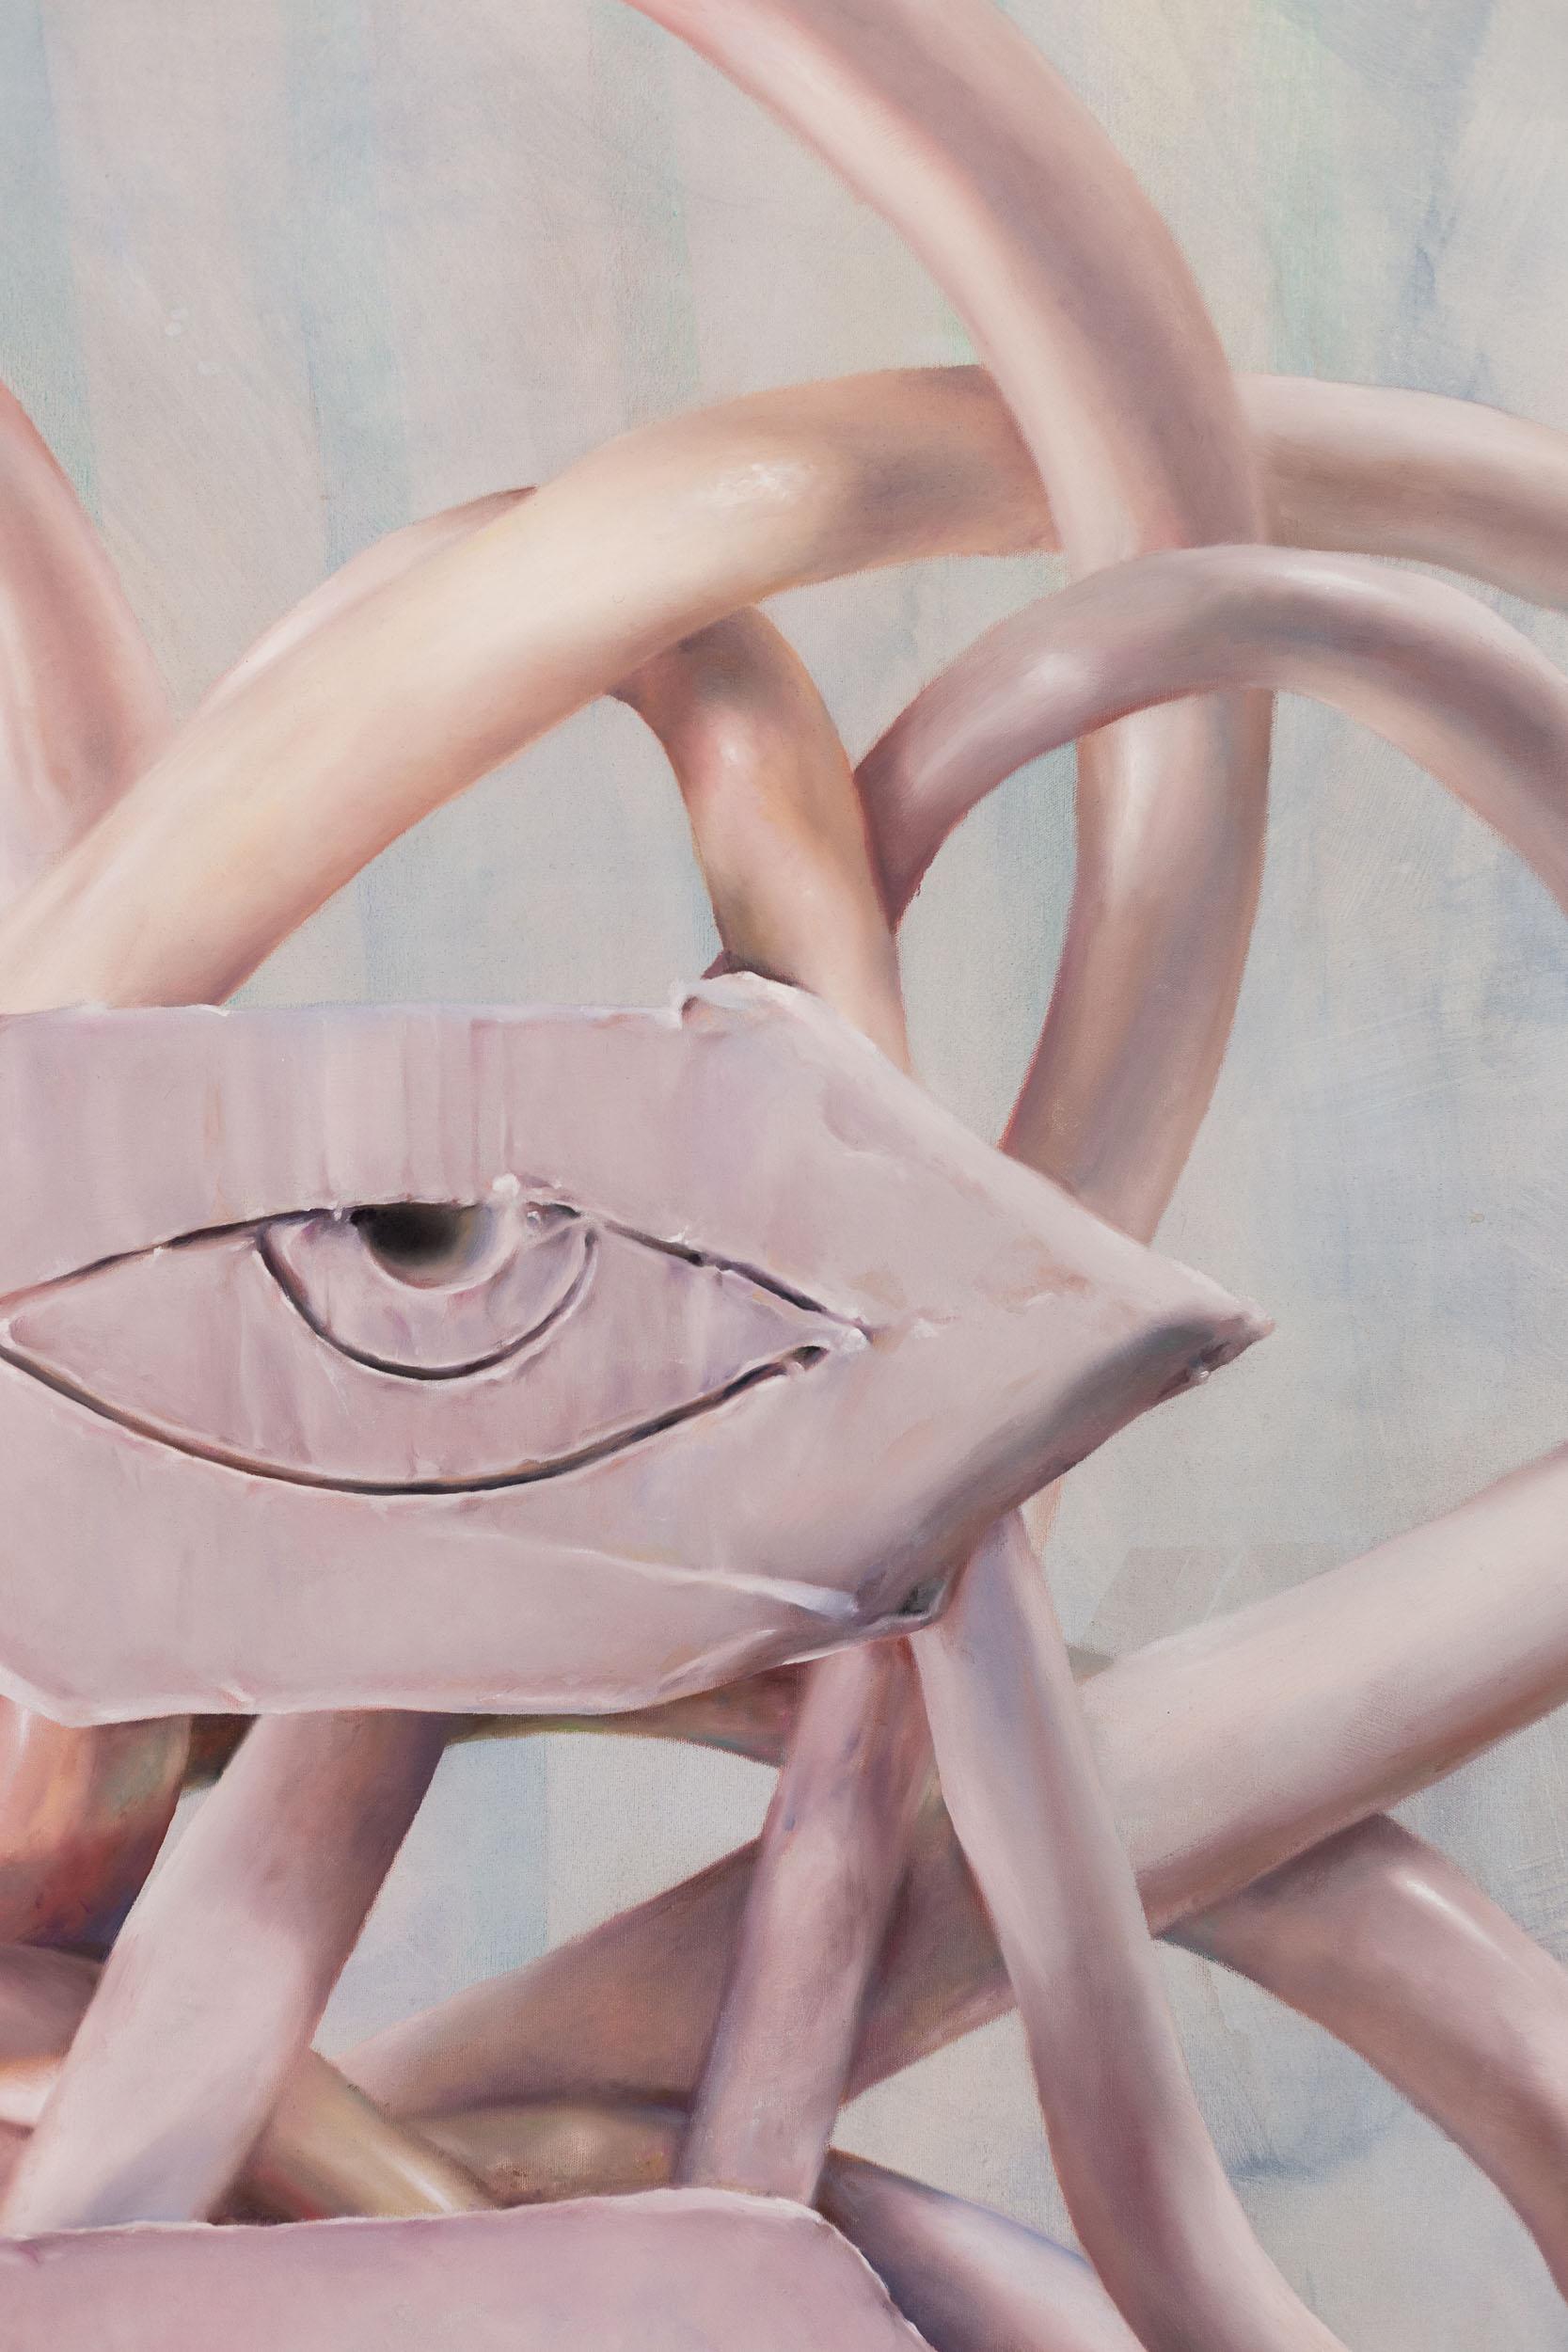 Francisco Sierra,  OogGod  (detail), 2017, oil and color pencil on canvas, 220 x 180 cm  Photo: Kilian Bannwart